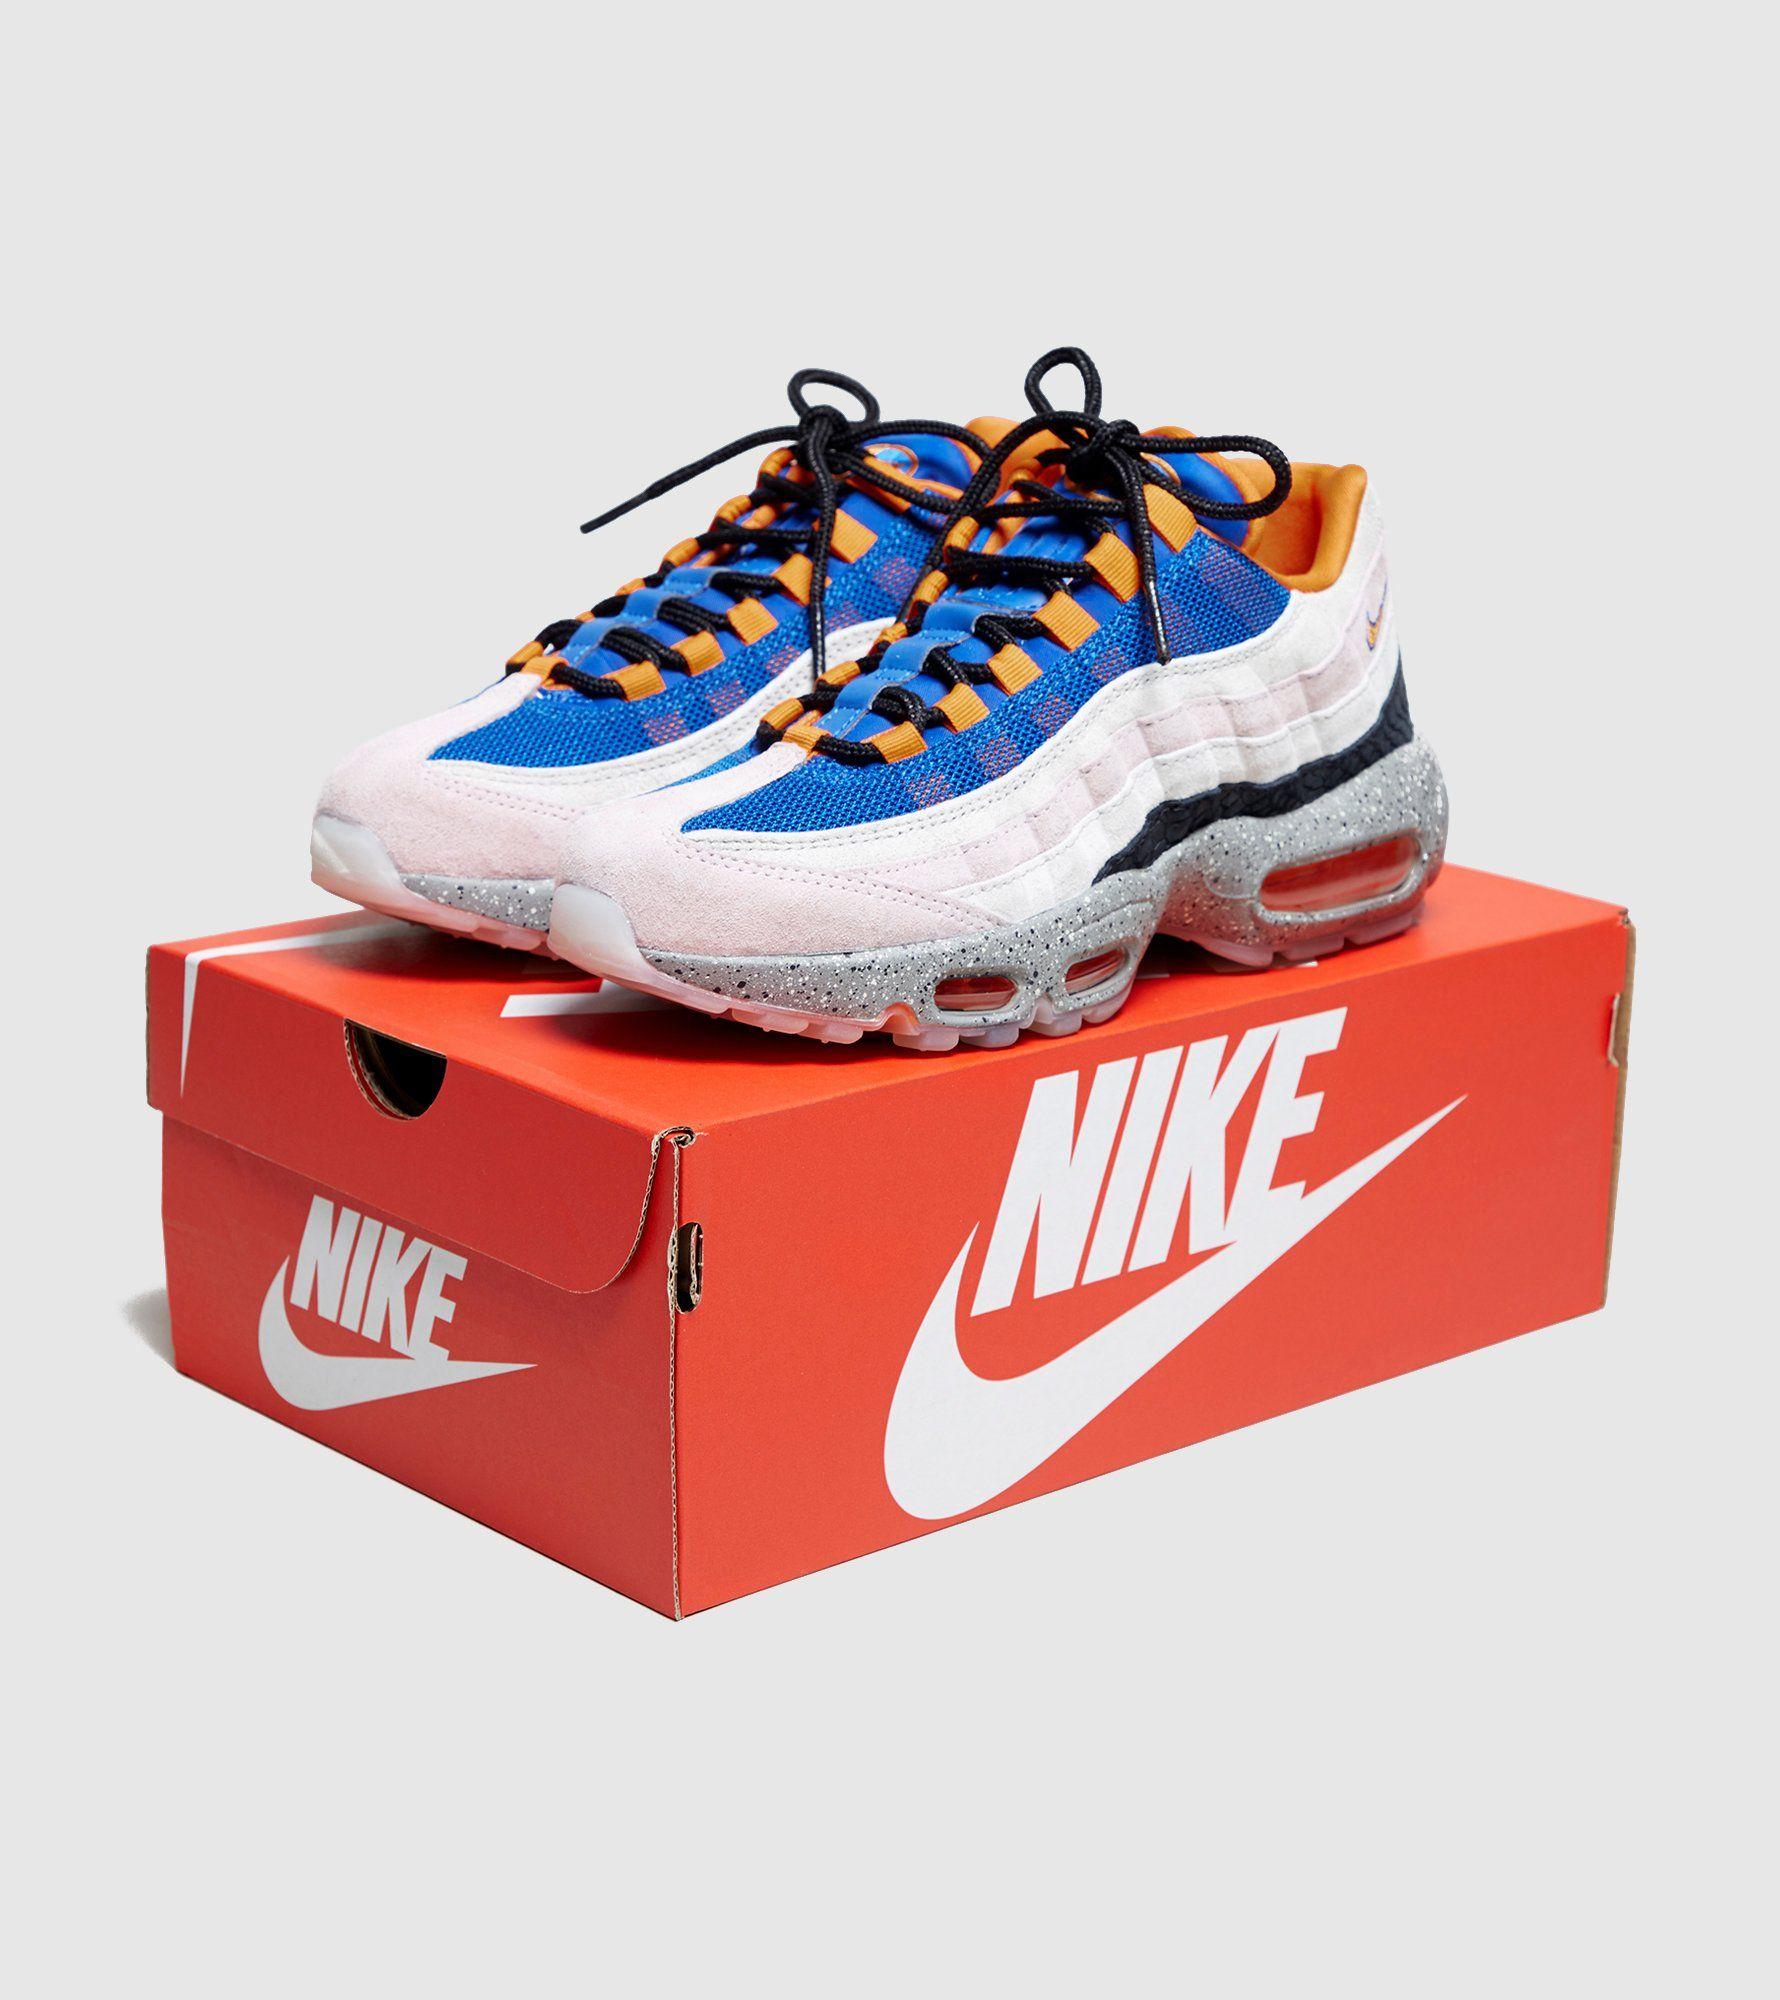 Nike Air Max 95 Greatest Hits Dam